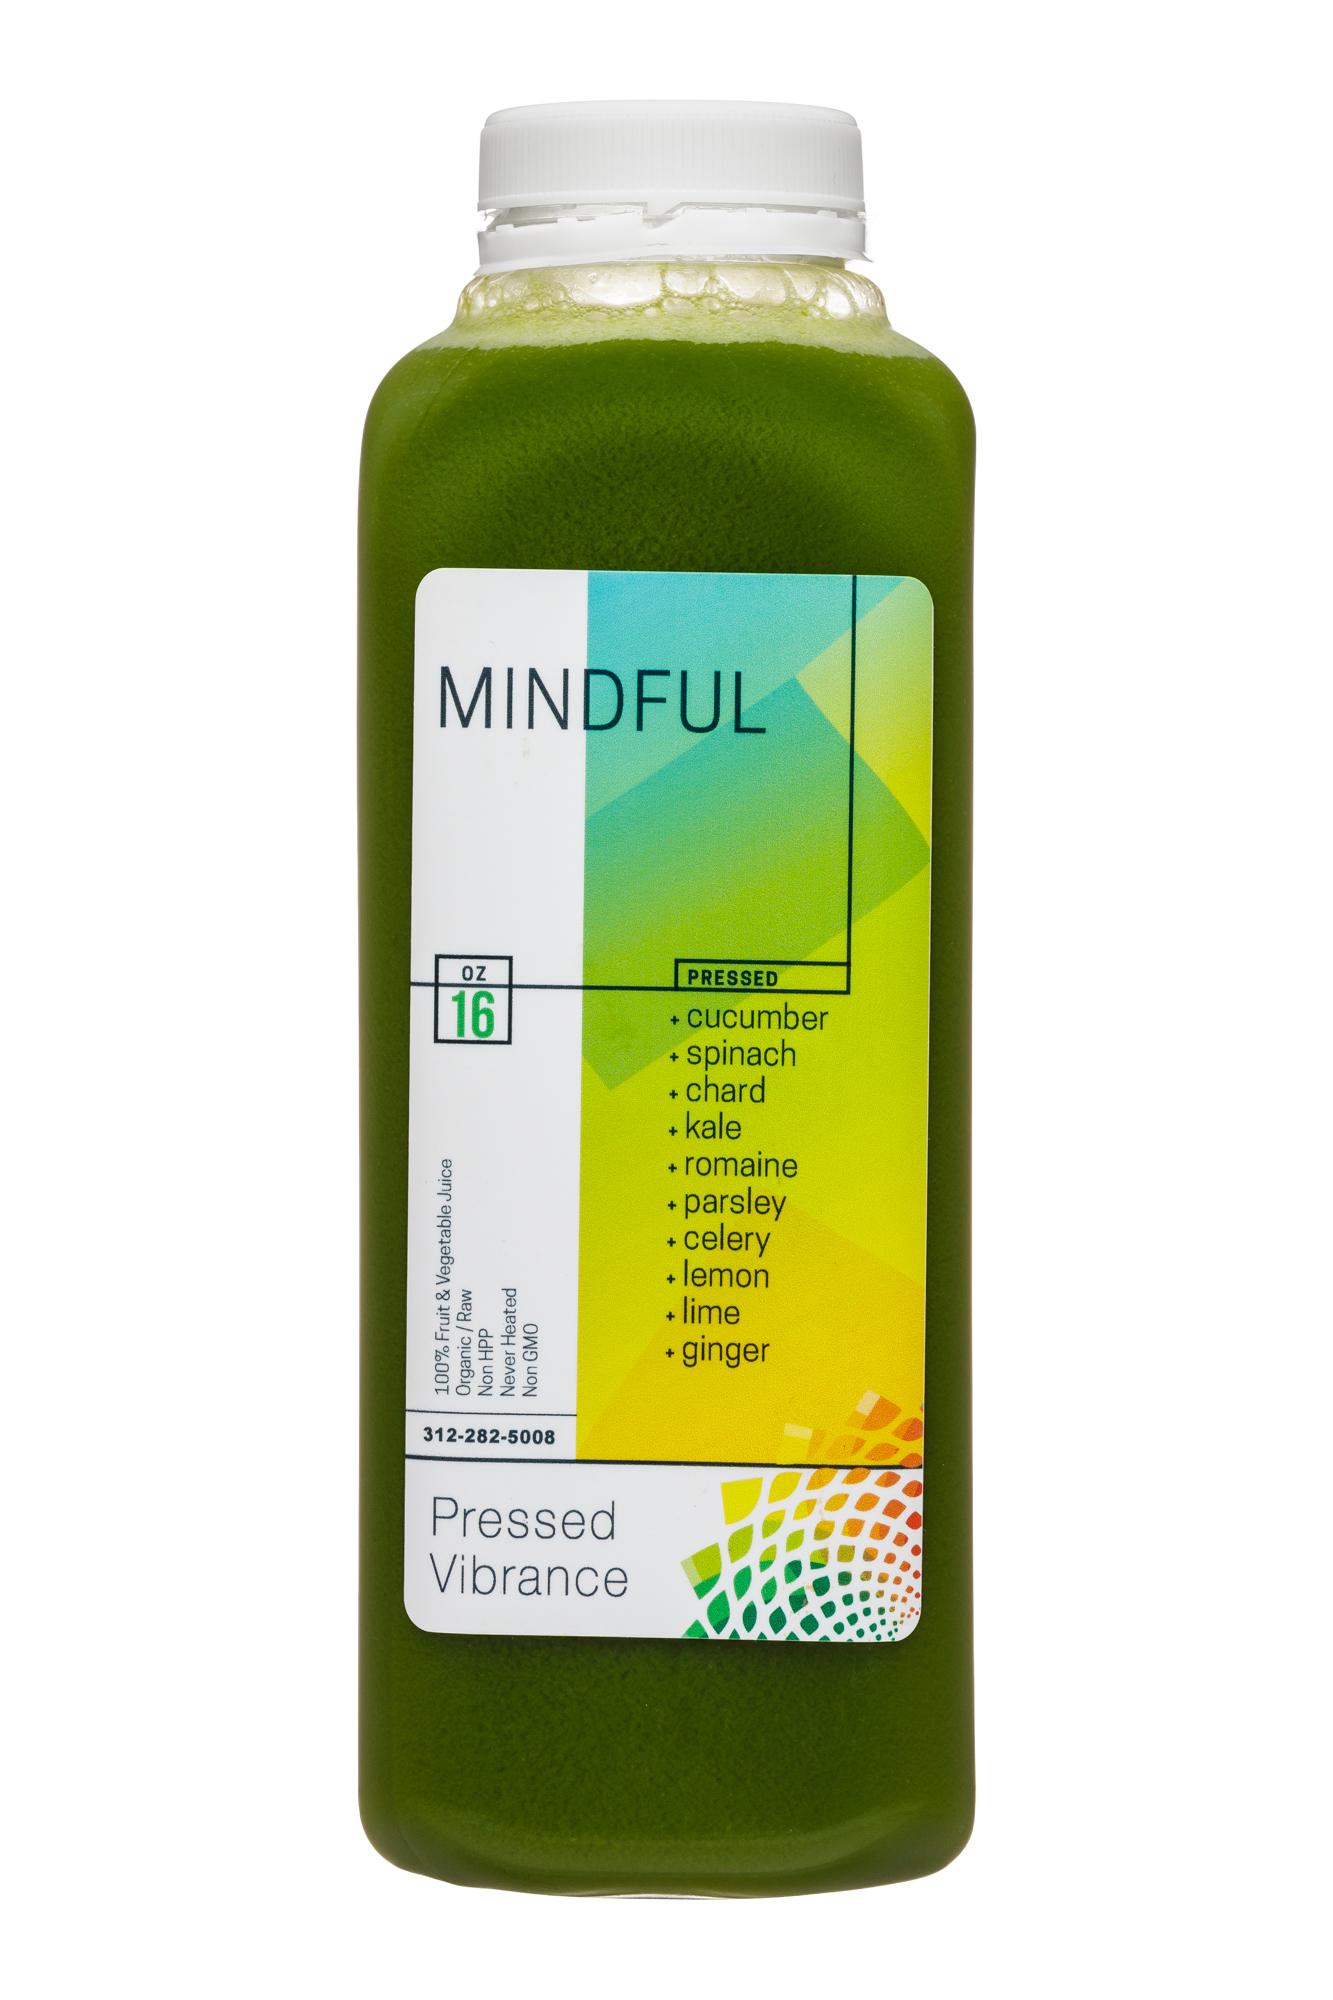 Pressed Vibrance: PressedVibrance-16oz-Mindful